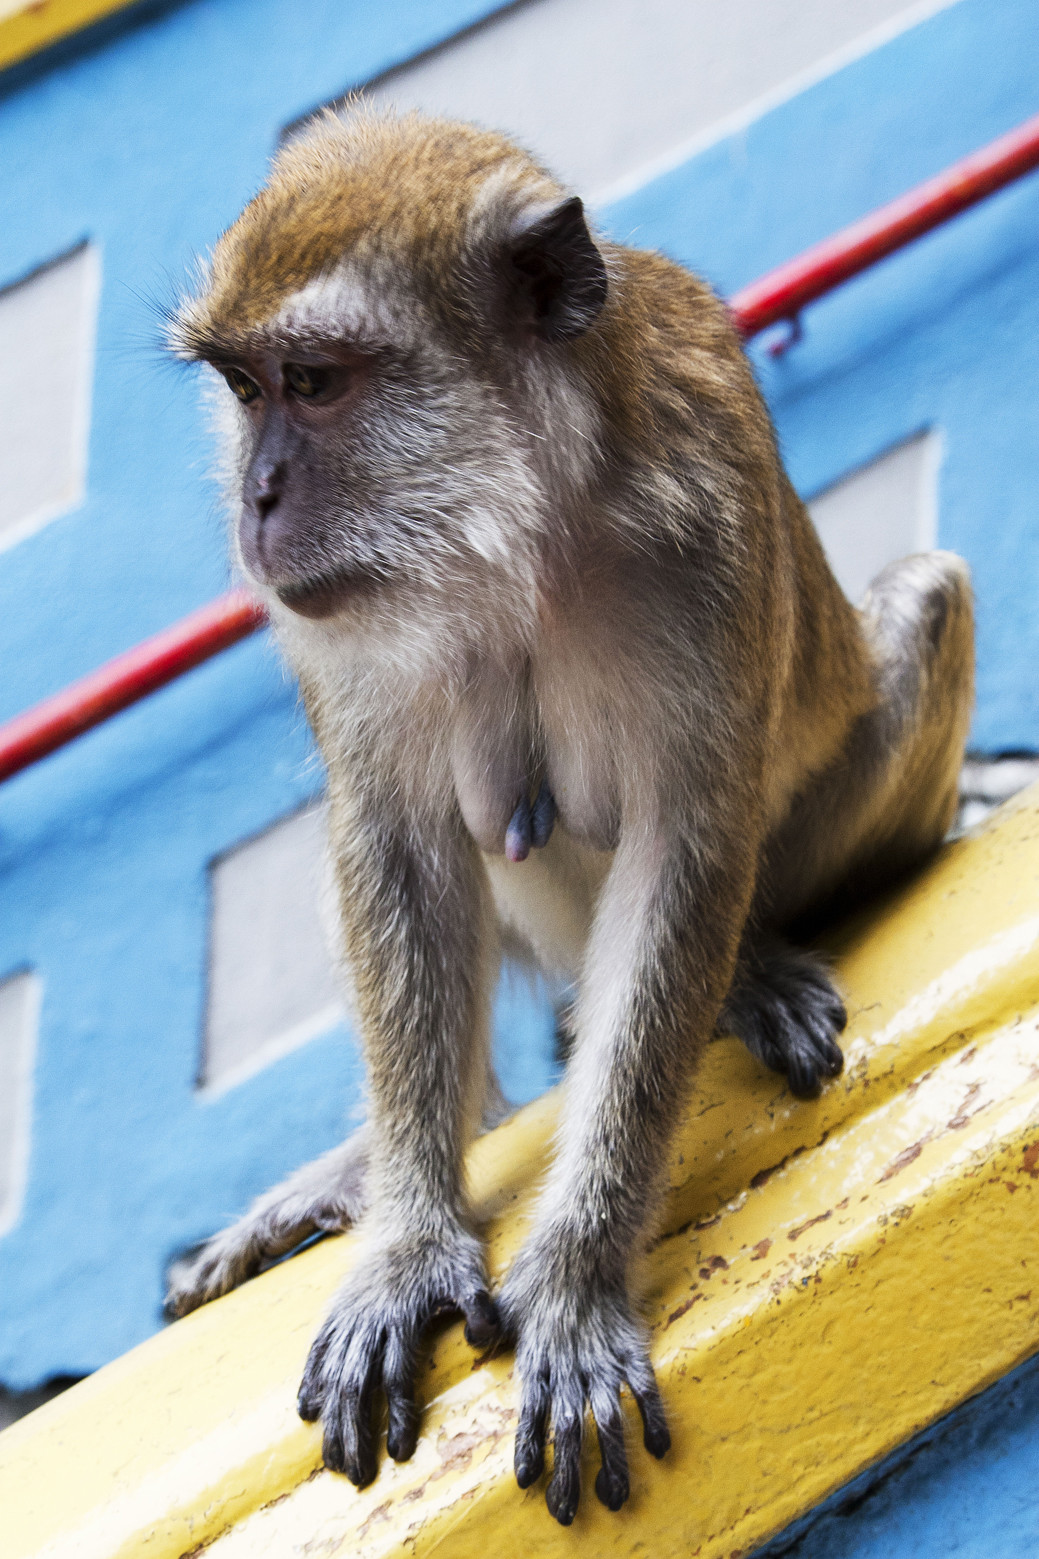 7532e5dbfcf Kuala Lumpur - Toen kwam de aap uit de mouw...   Columbus Travel